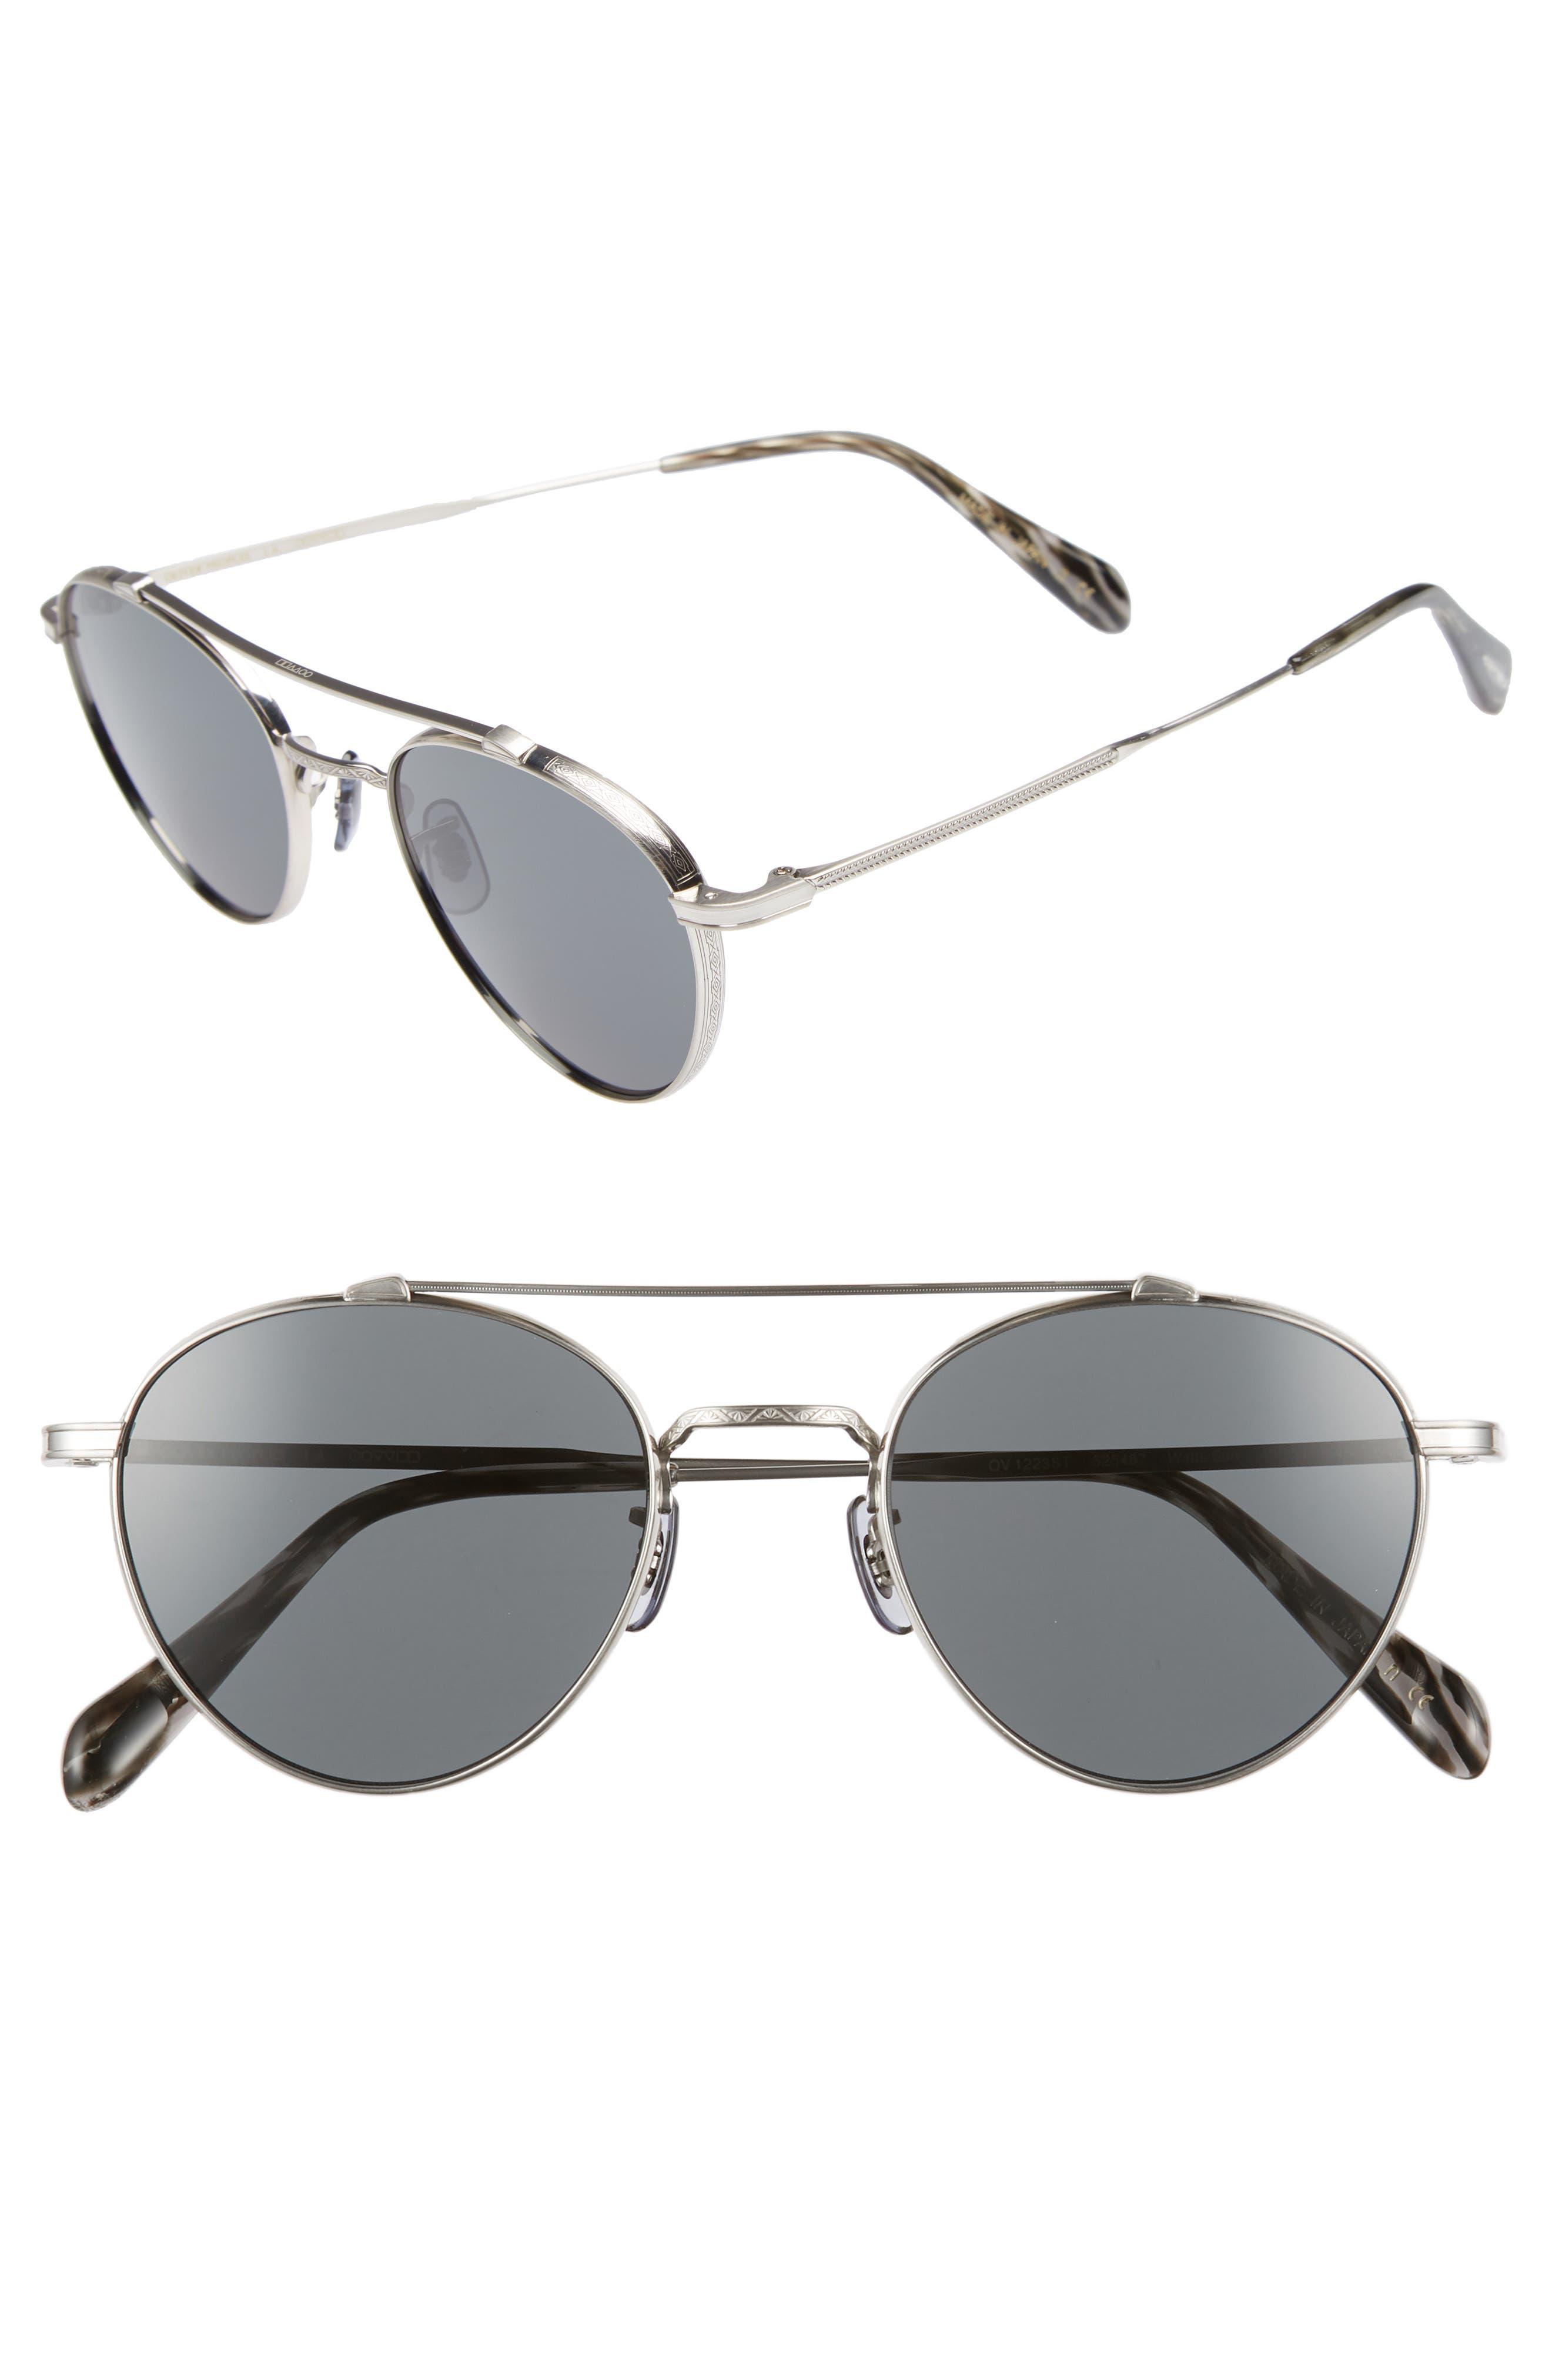 Watts 49mm Round Sunglasses,                             Main thumbnail 1, color,                             Grey